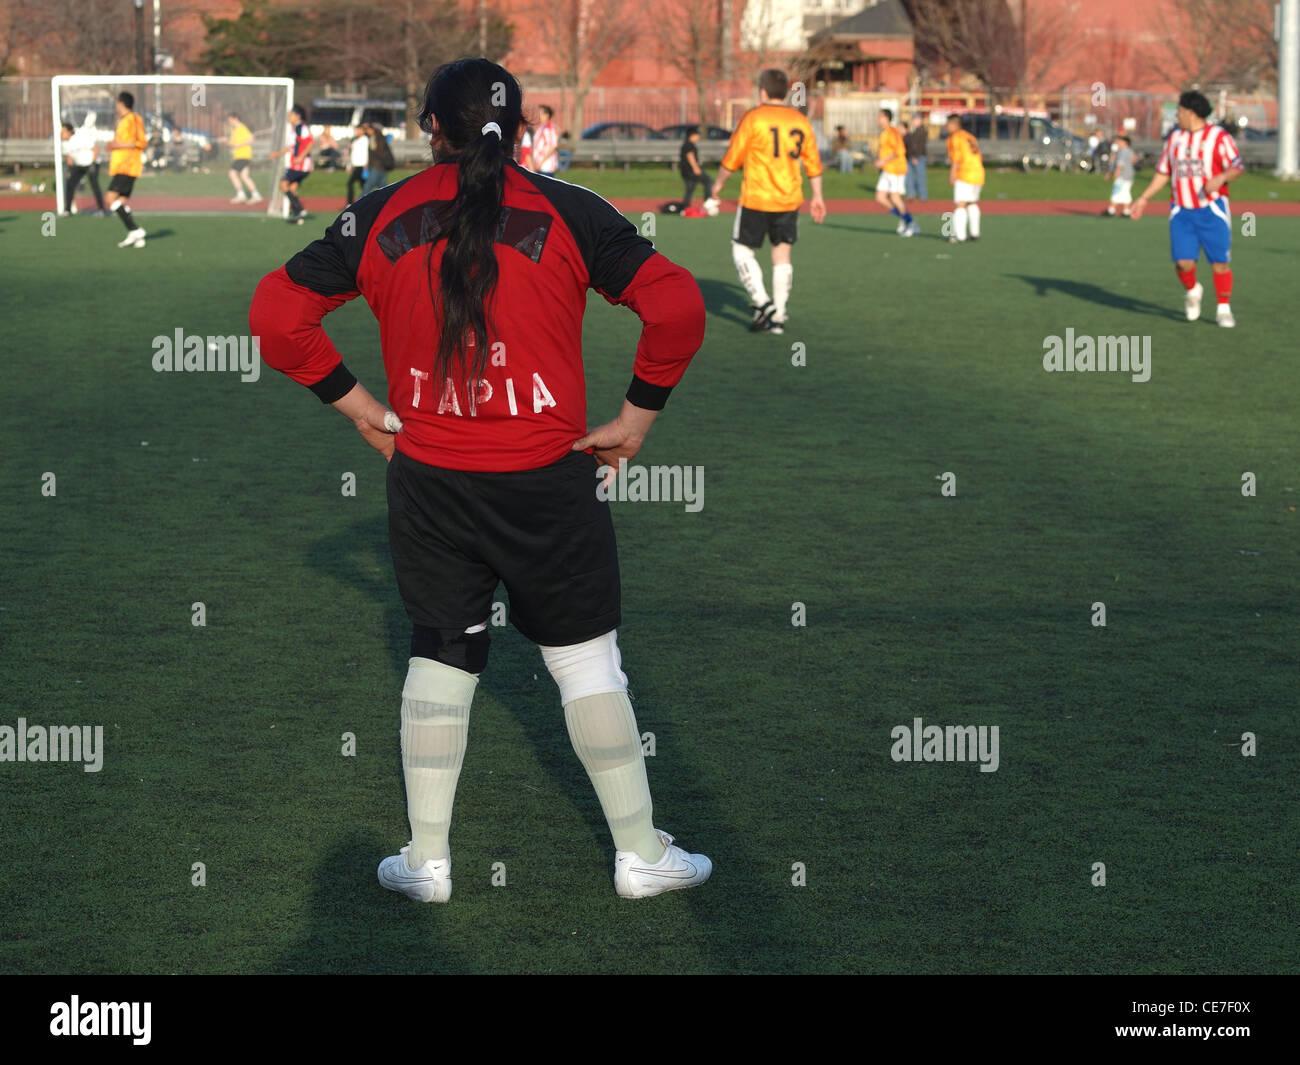 Gardien de but jeu de foot amateur, McCarren Park, Brooklyn, New York fe3fc62c10d